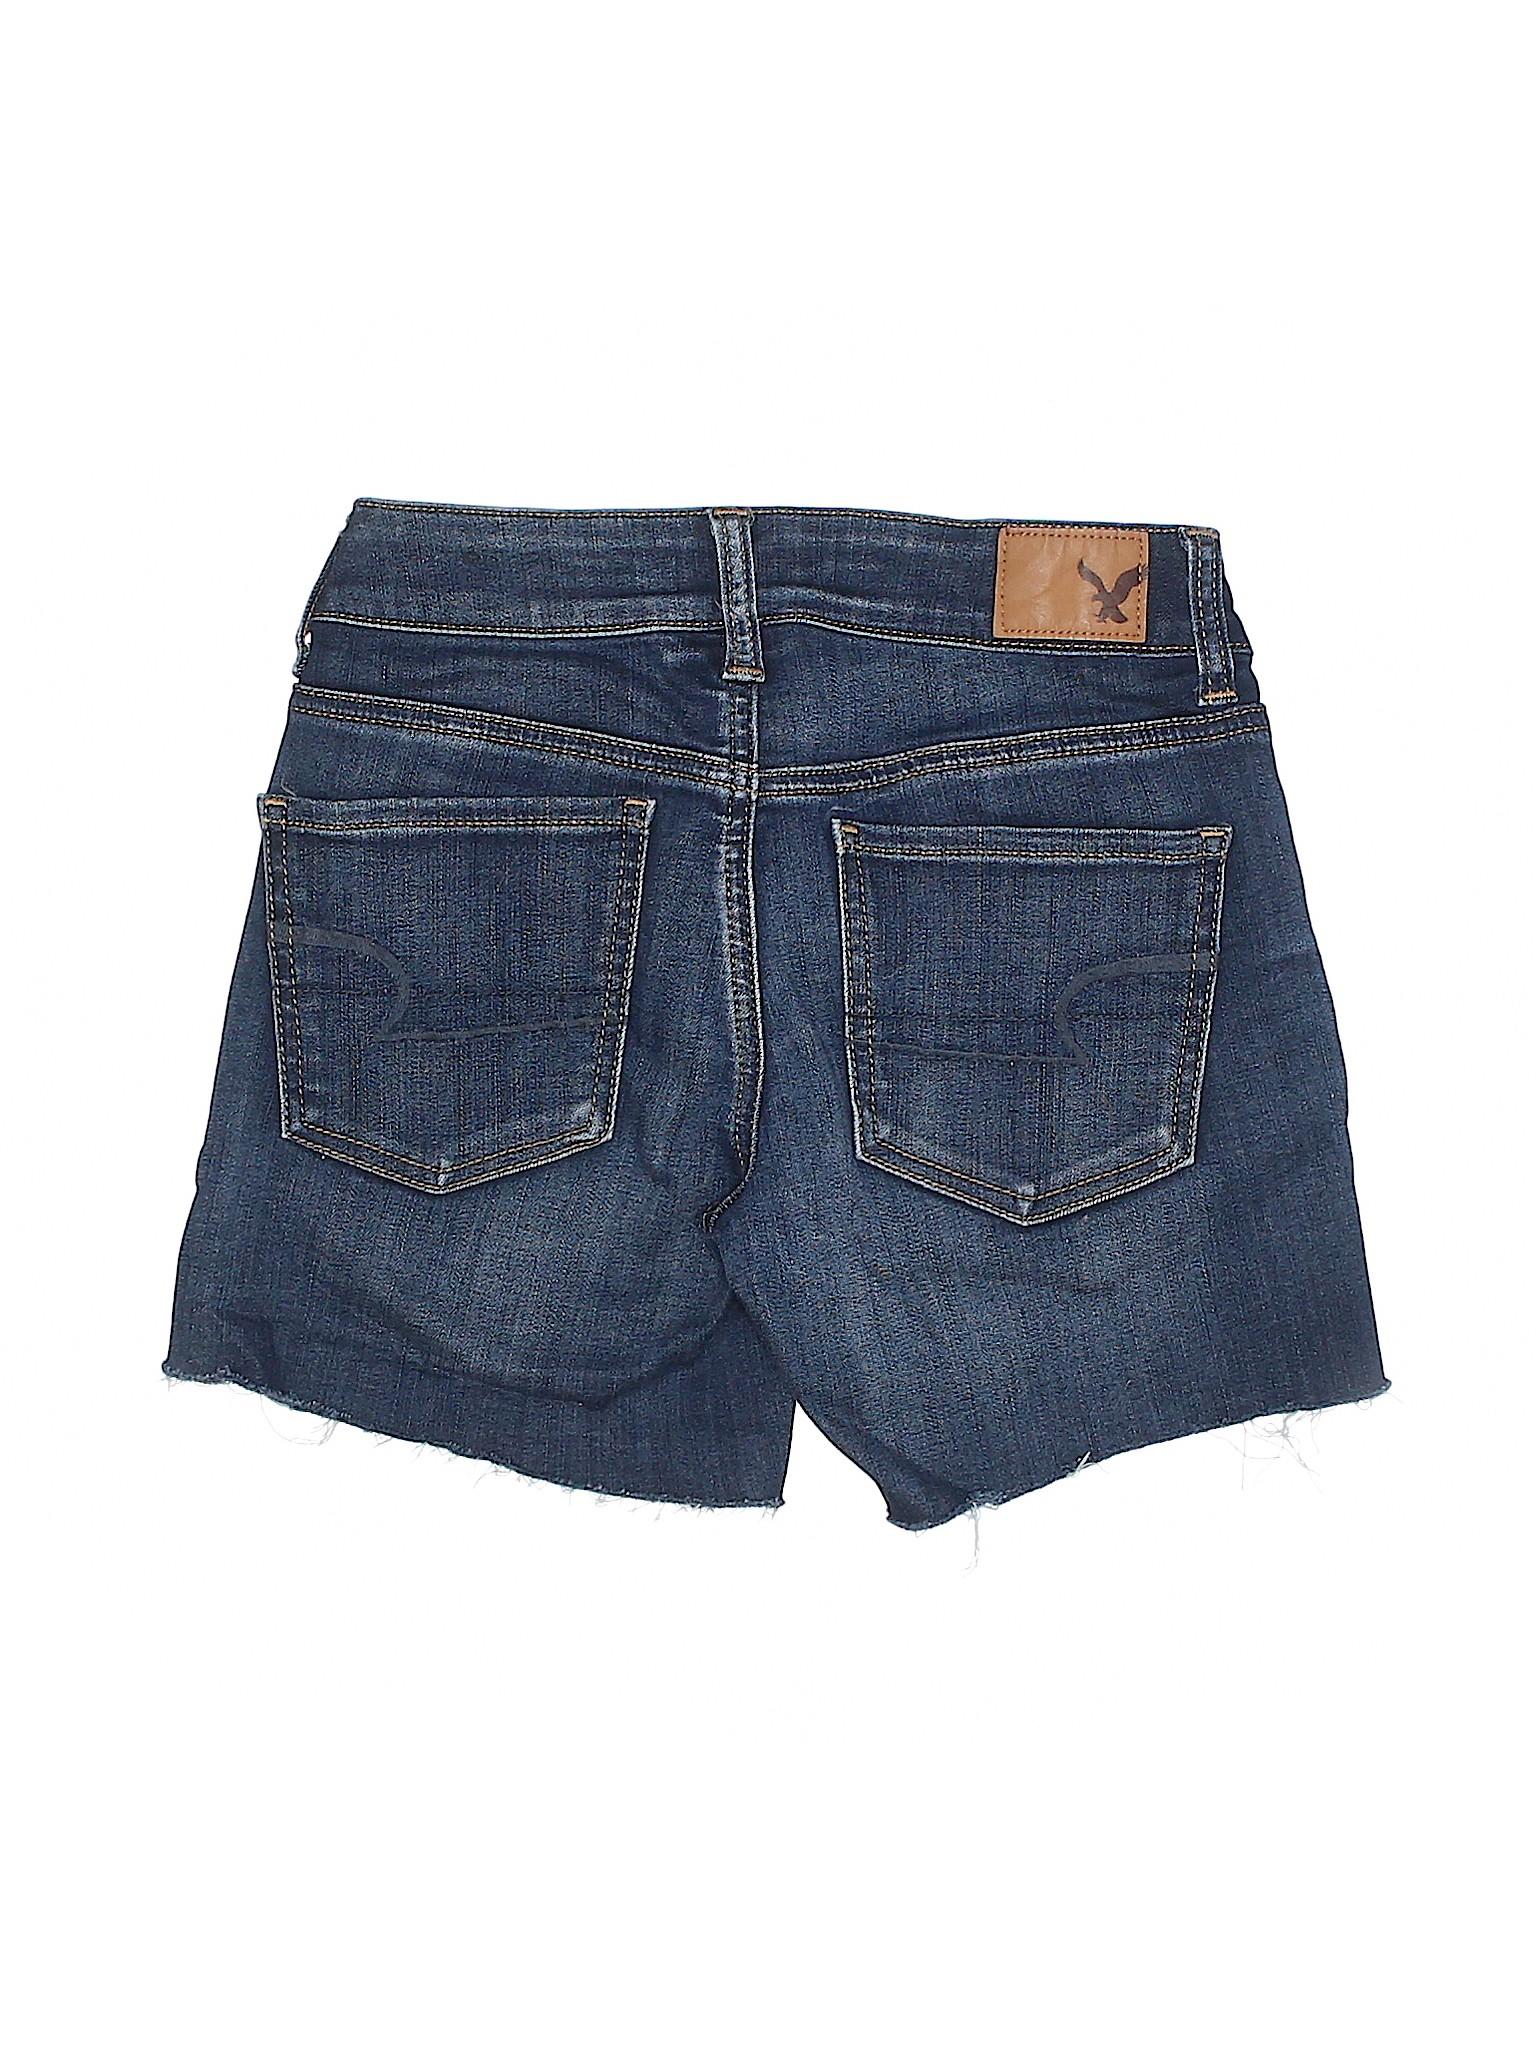 Shorts Denim Outfitters American Eagle Boutique CUIqx